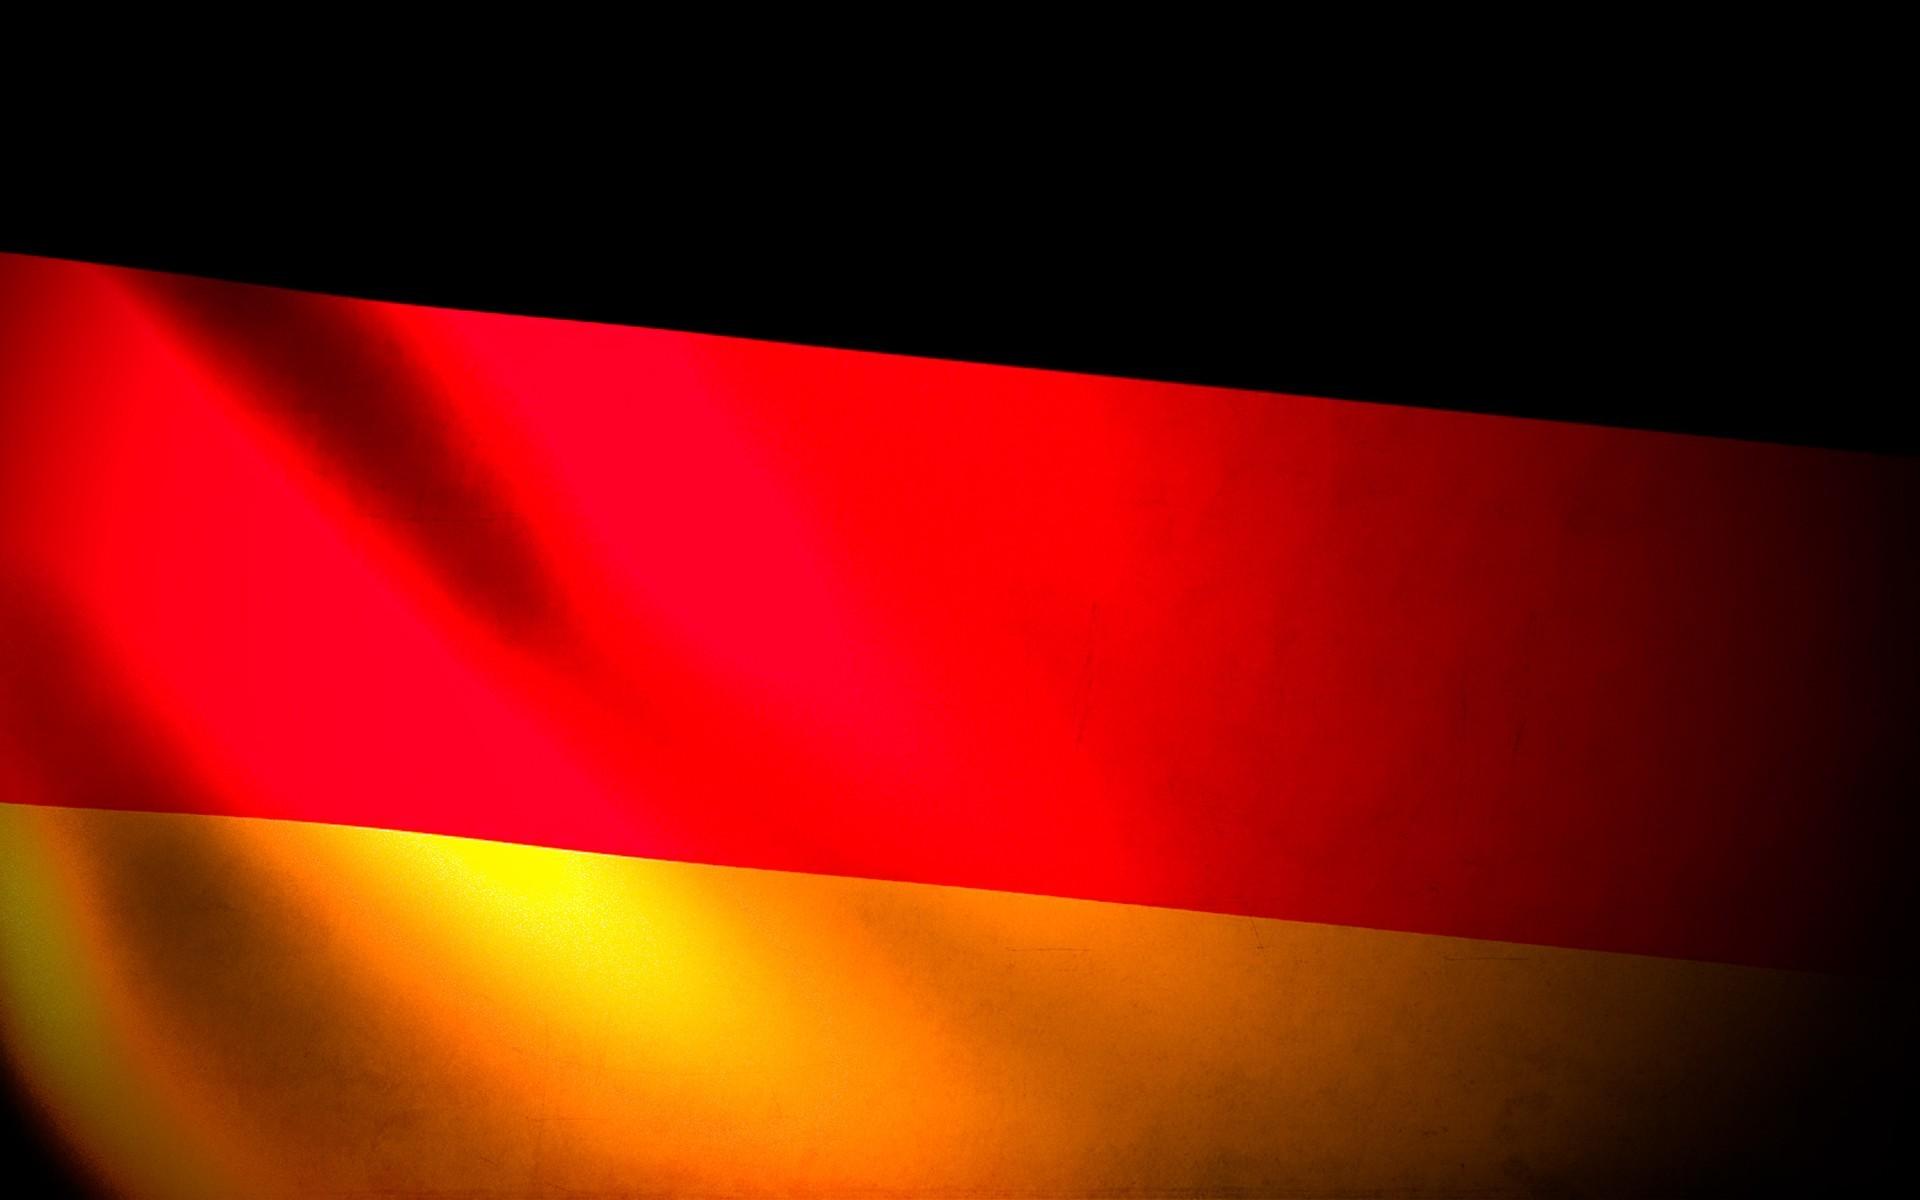 German Flag Wallpaper images 1920x1200